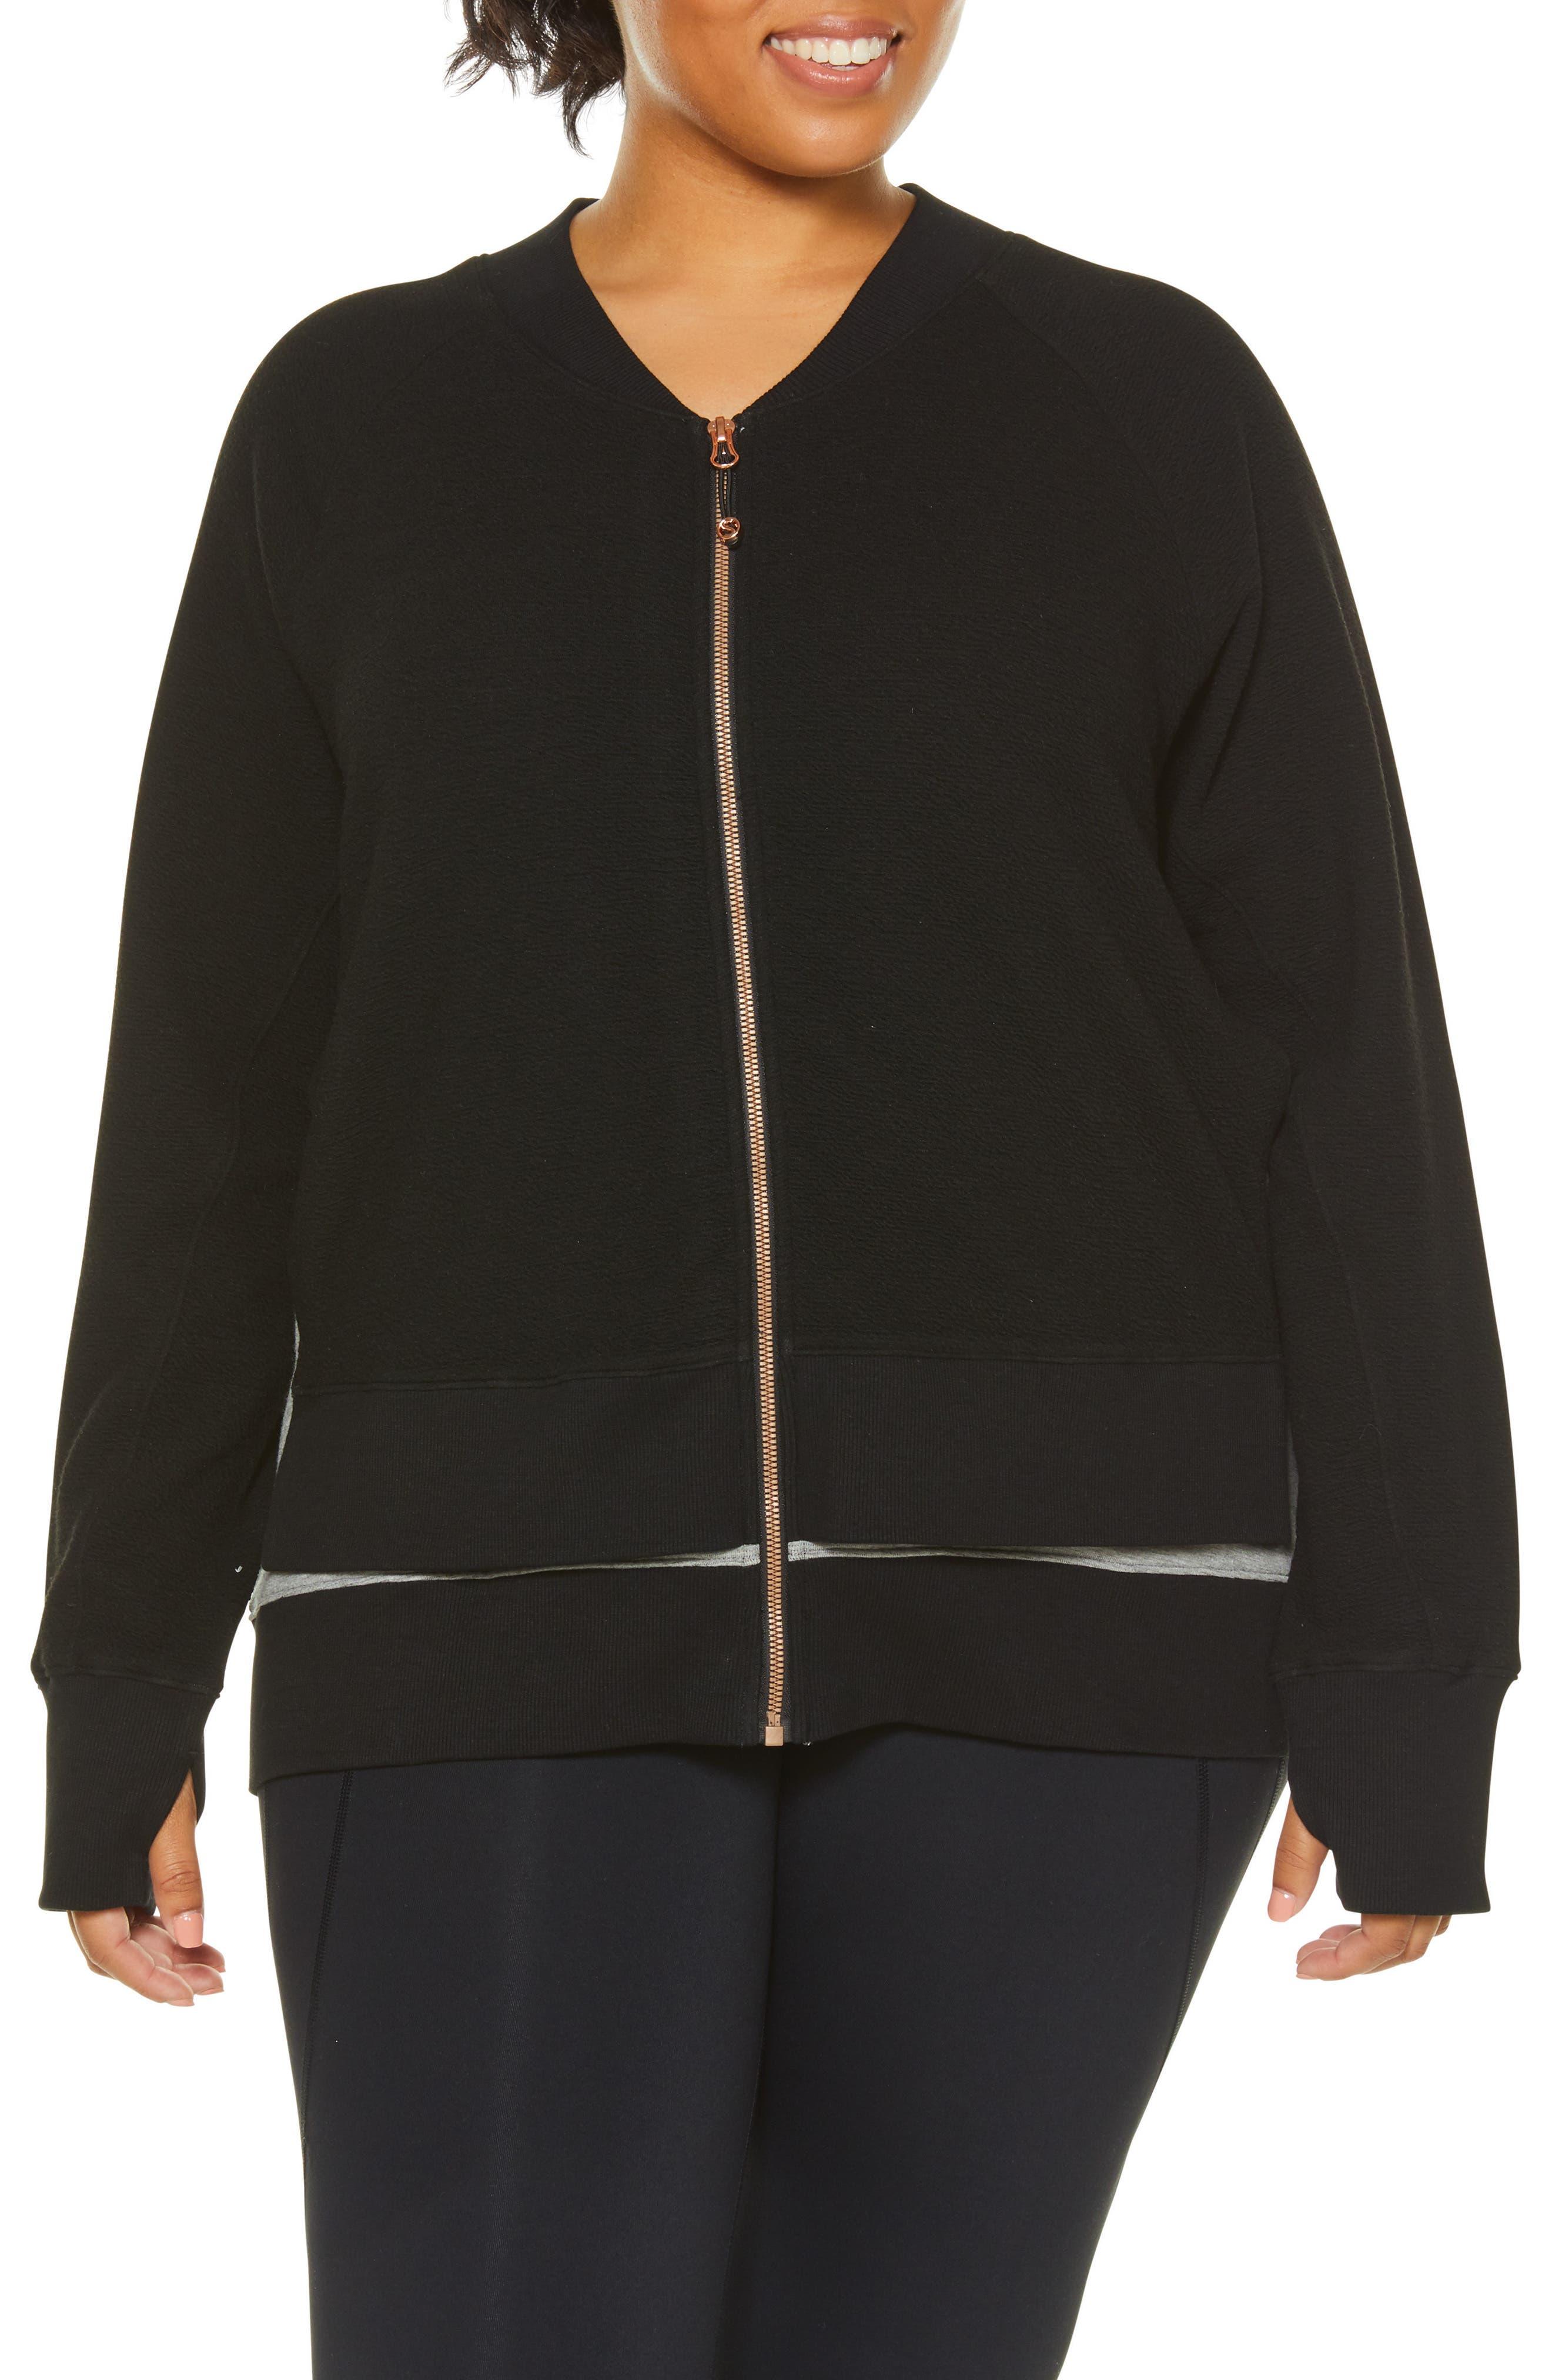 Sublime Double Layer Jacket,                             Alternate thumbnail 4, color,                             BLACK/ GREY HEATHER